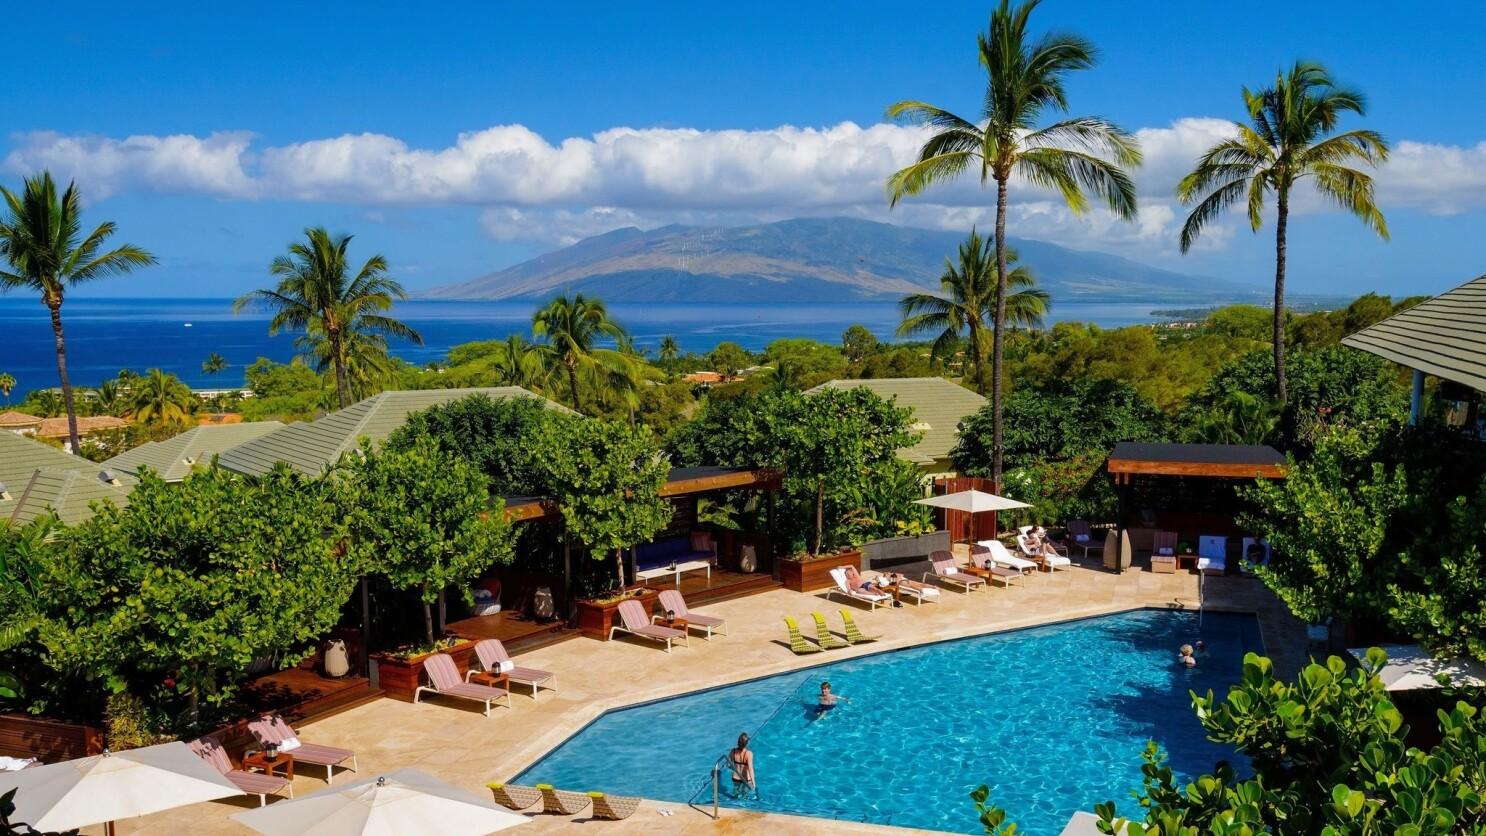 Maui's Wailea resorts are best in Hawaii, Condé Nast Traveler's ...